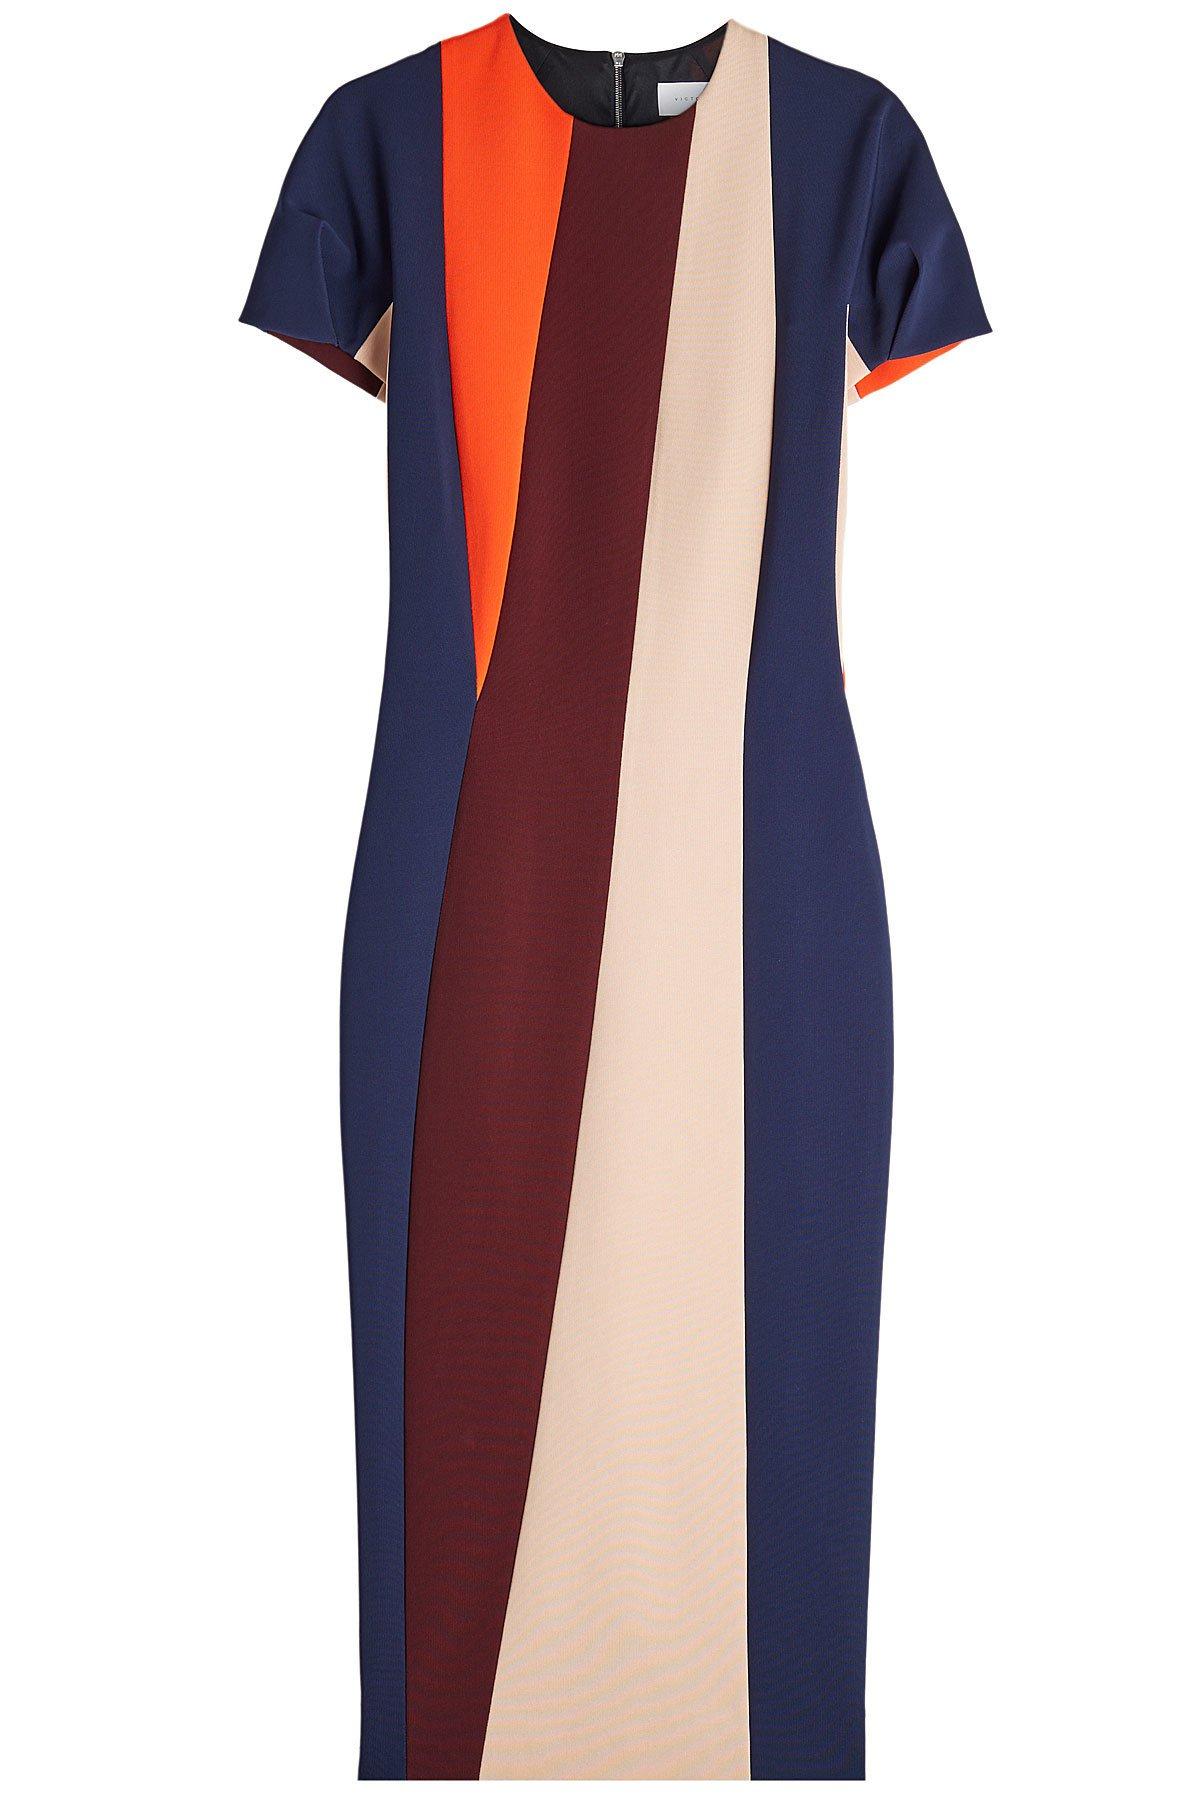 Pleat Sleeve Pencil Dress Gr. UK 14